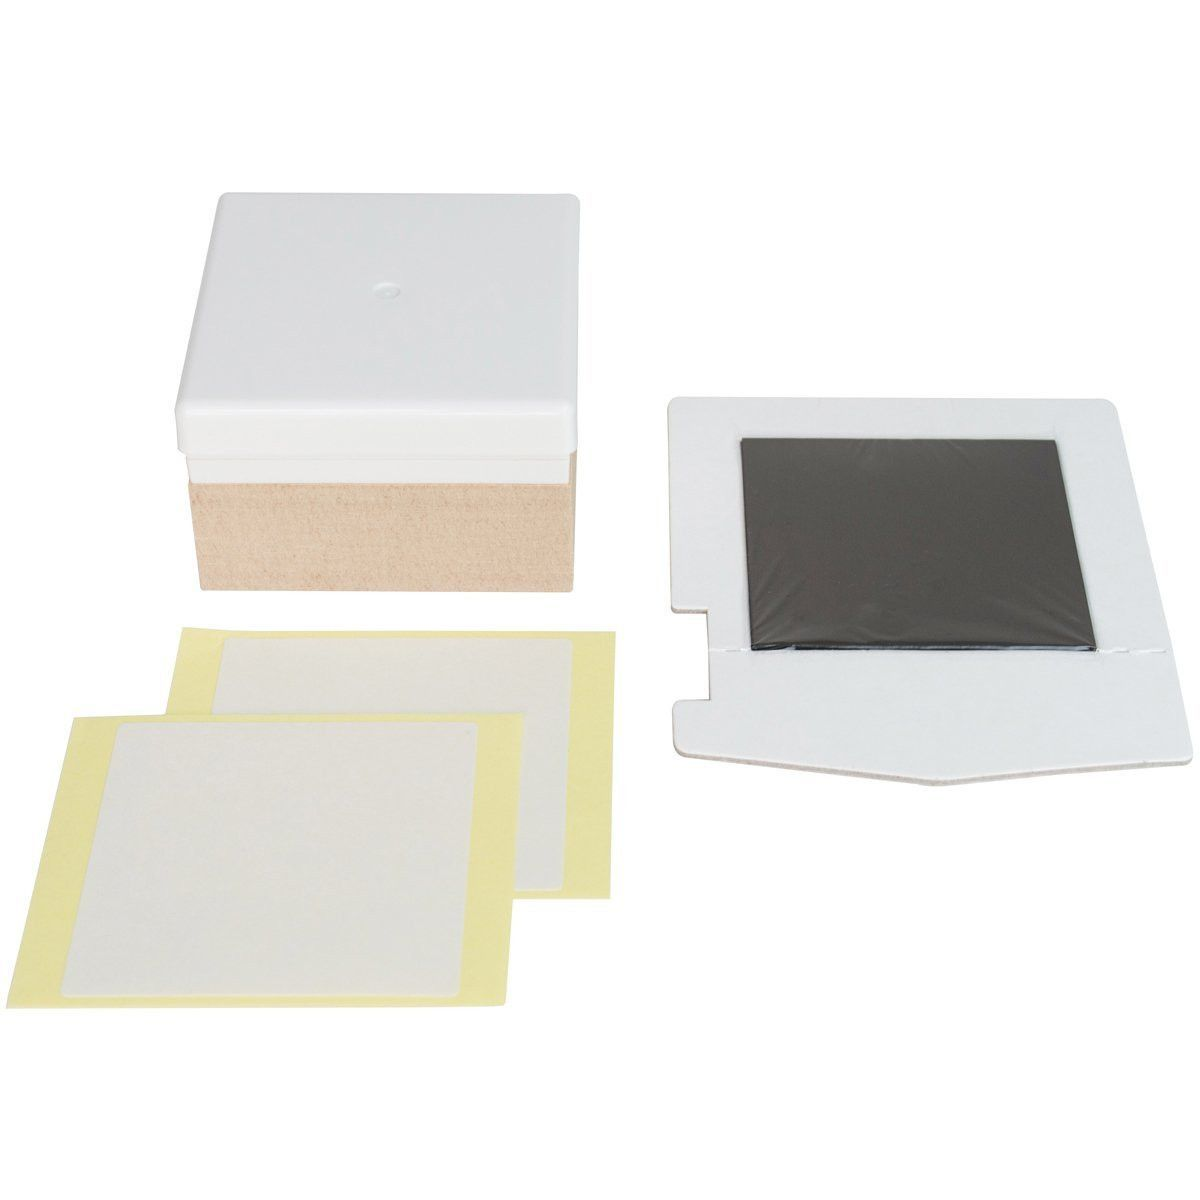 Silhouette Mint Stamp Kit 45 mm x 45 mm